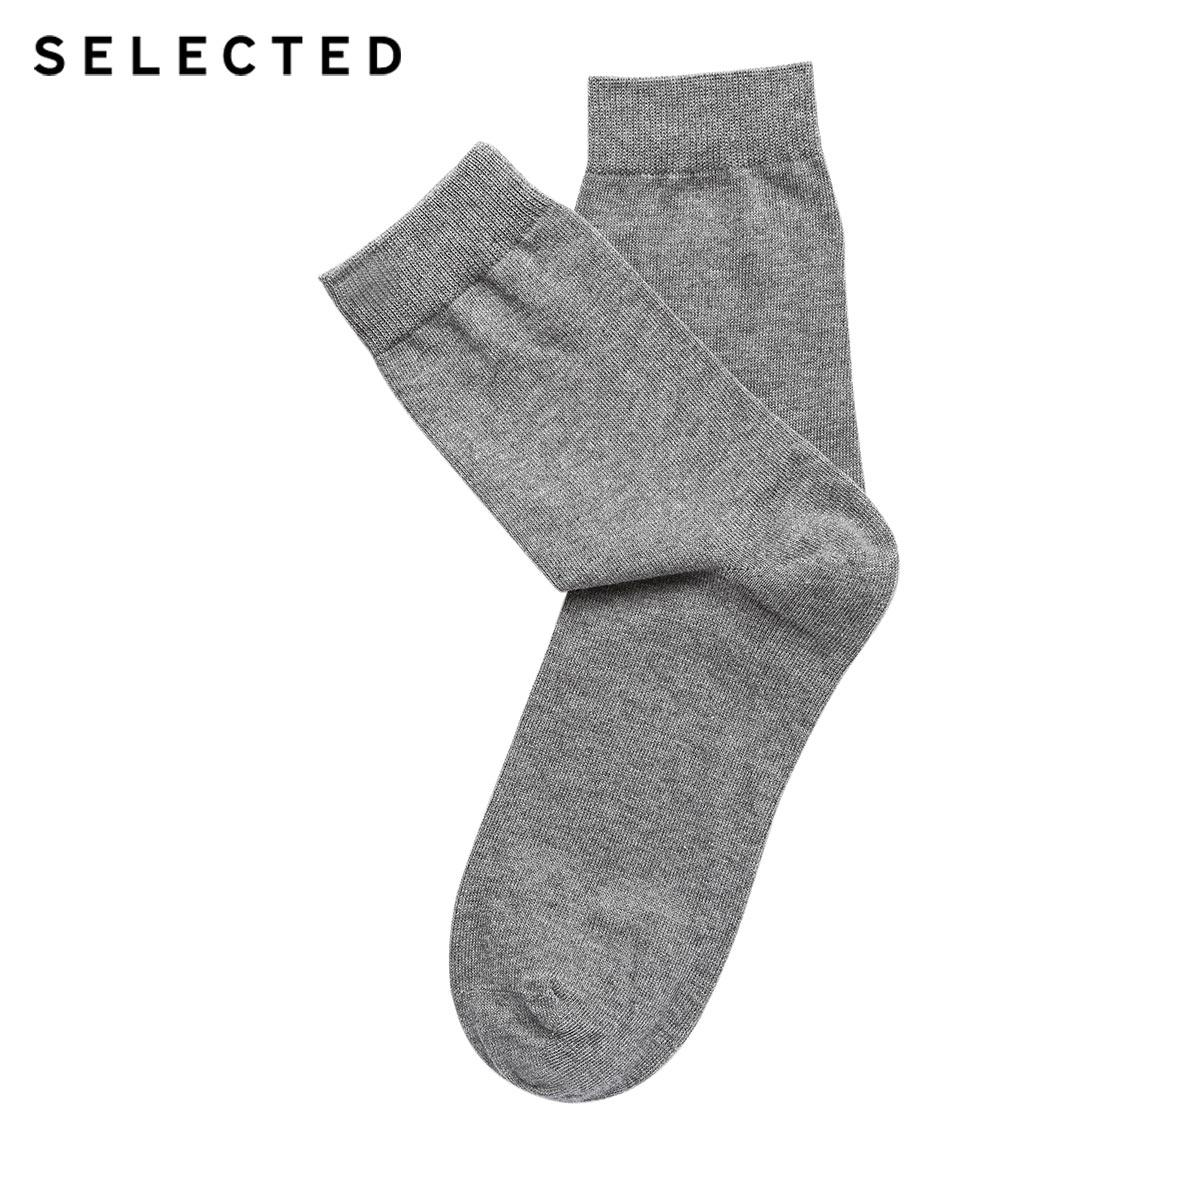 SELECTED Men's Pure Color Three-pack Grey Socks  A 41831Q511